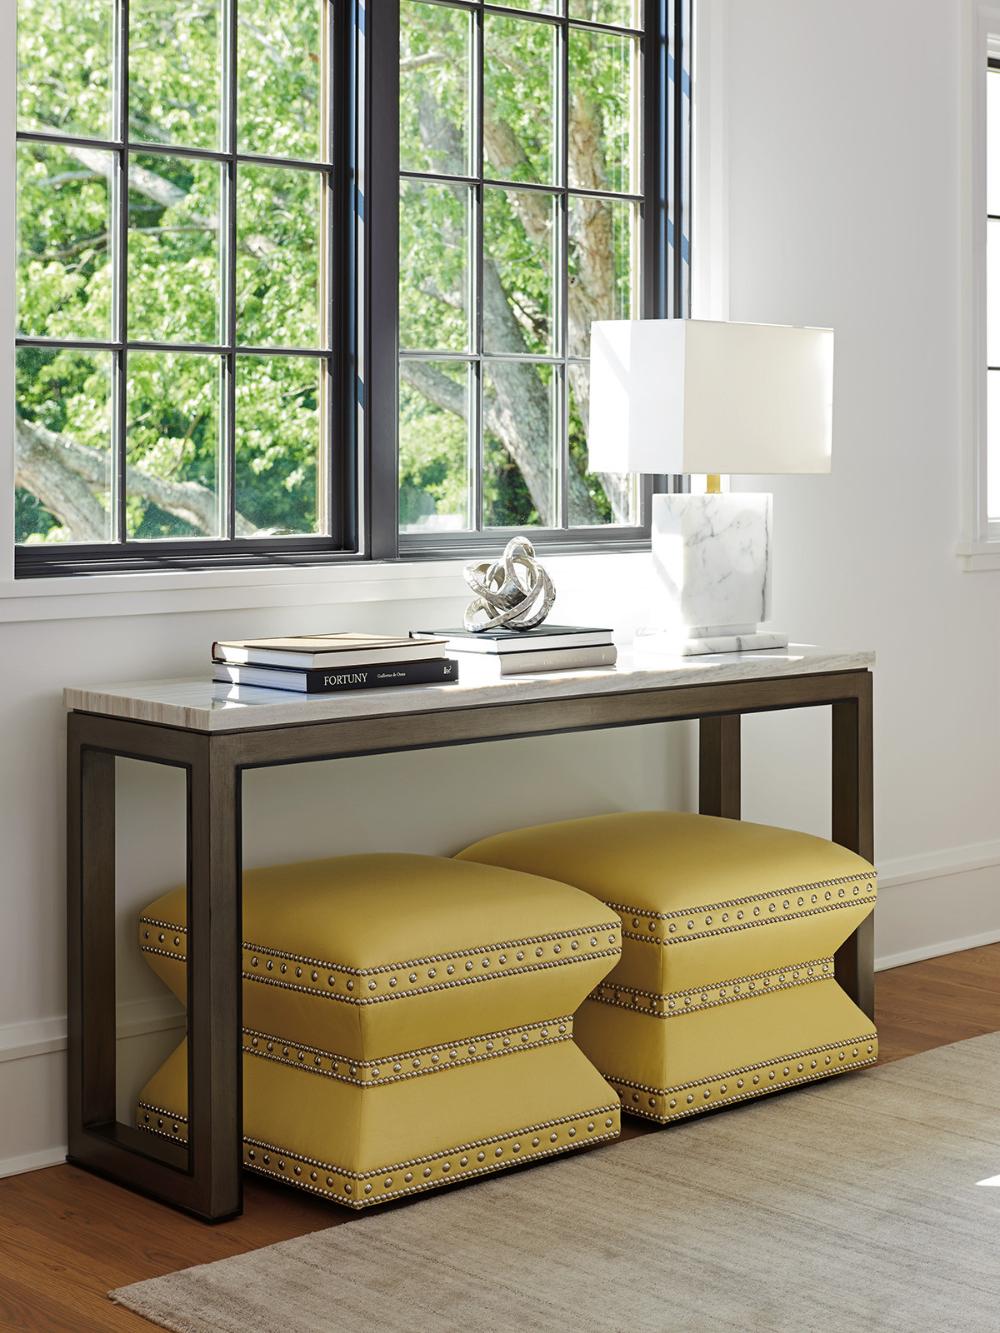 Vernay Console | Lexington Home Brands | Lexington home ...